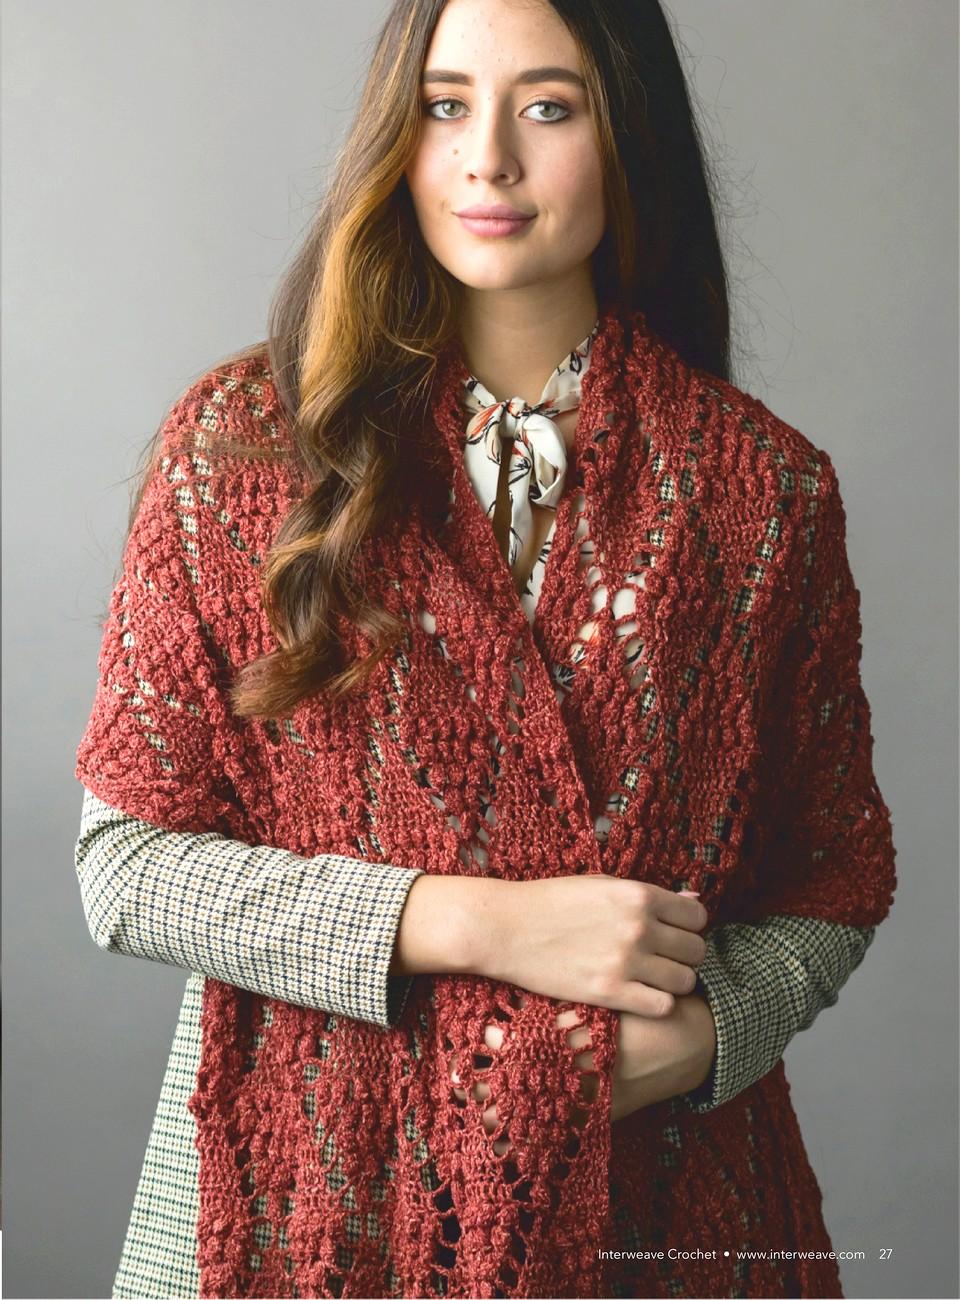 Interweave Crochet Winter 2019-28